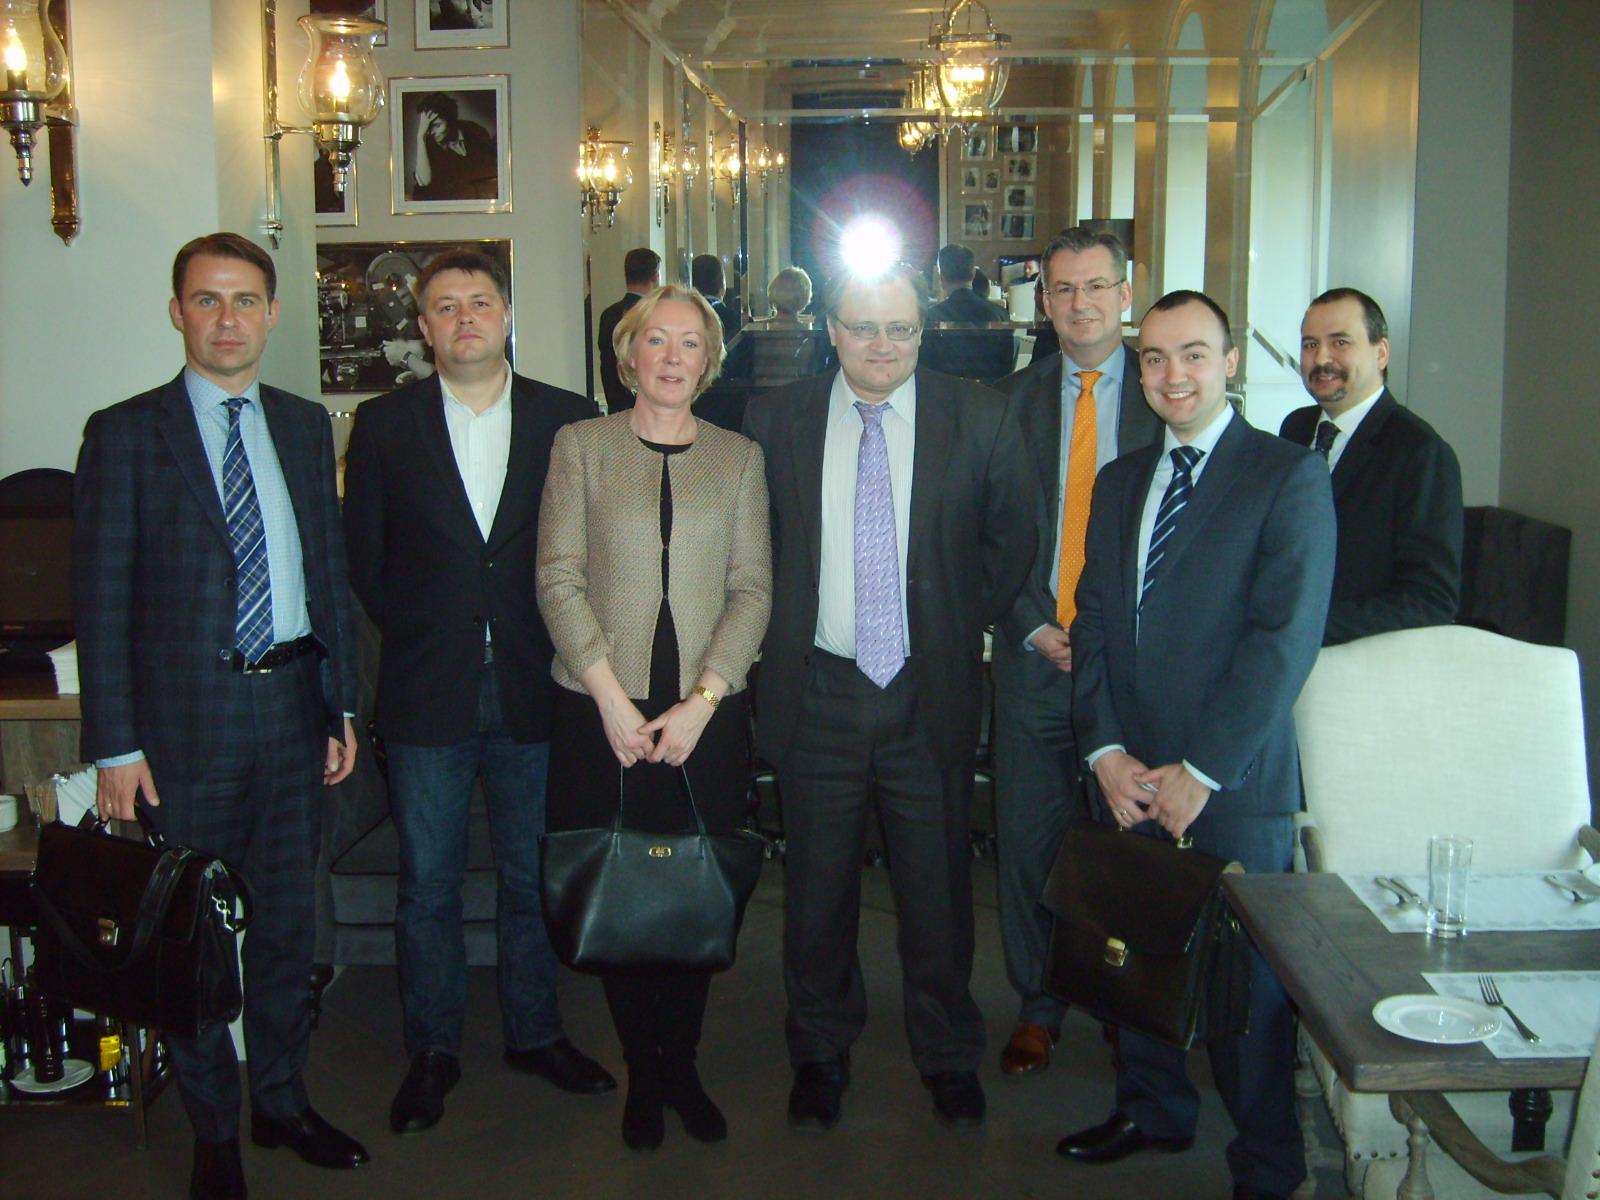 Shevtsov_Yuriy_Vyacheslavovich_2014_02_17_Dirk_Schuebel_and_EU_diplomats_in_Minsk